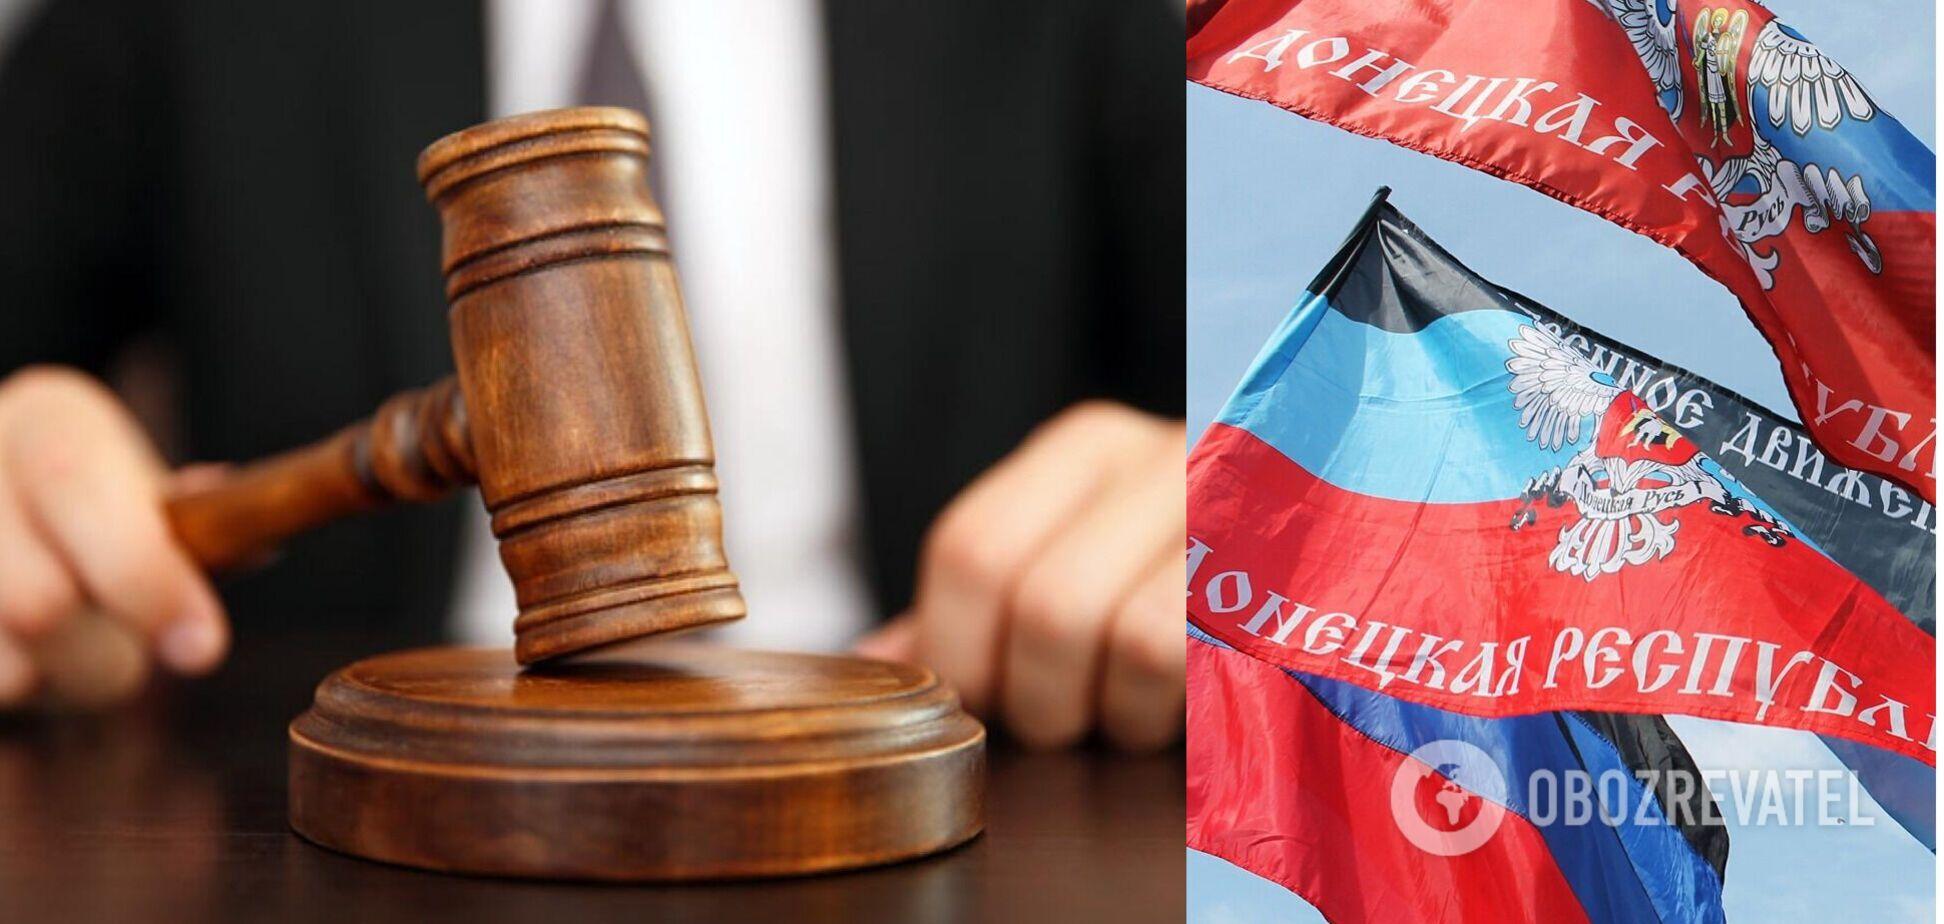 В Украине отправят под суд 'экс-замминистра 'ДНР'